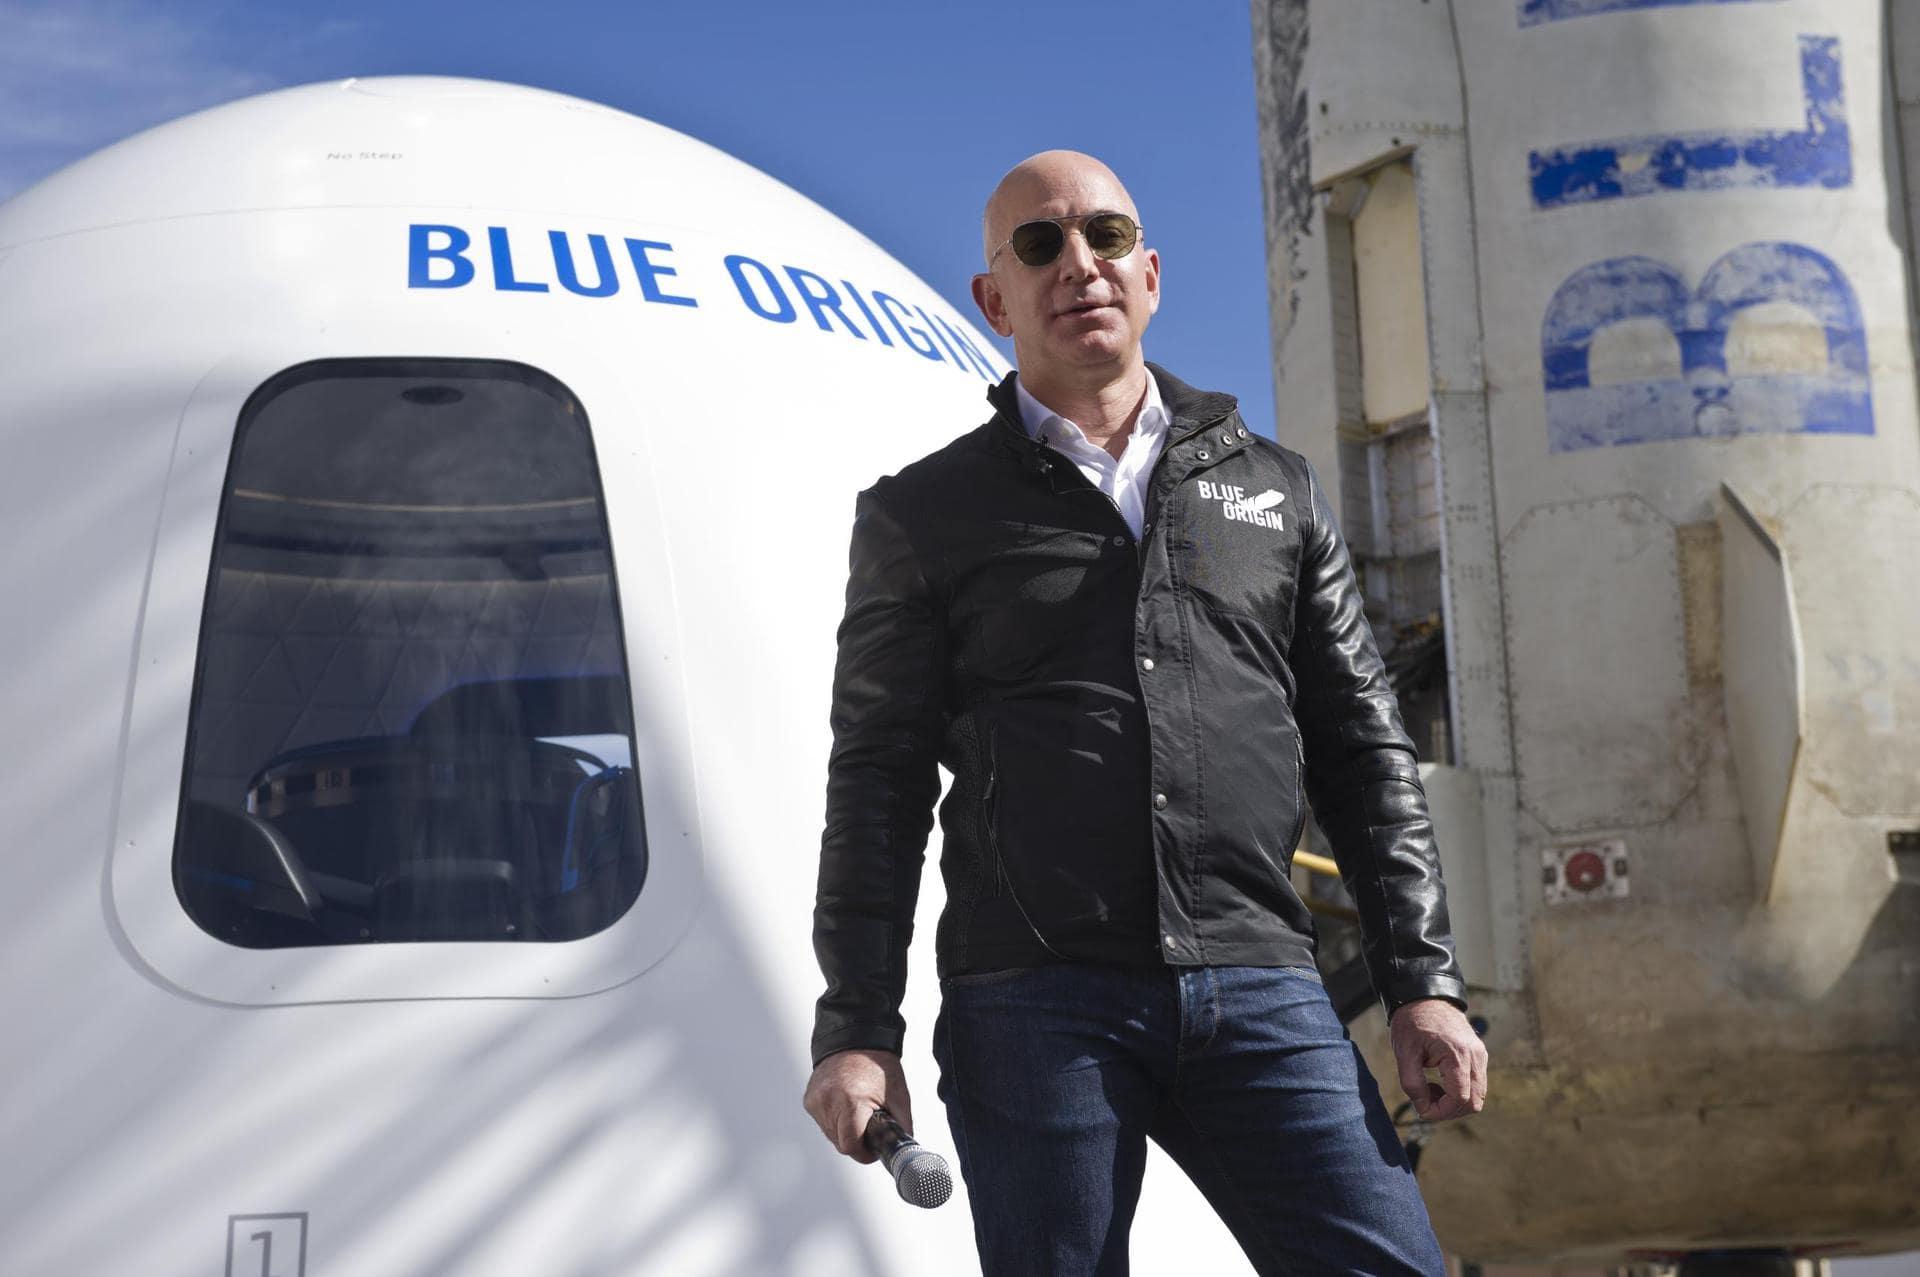 Amazon-Gründer Bezos zu Kurz-Ausflug ins All gestartet Raumfahrt